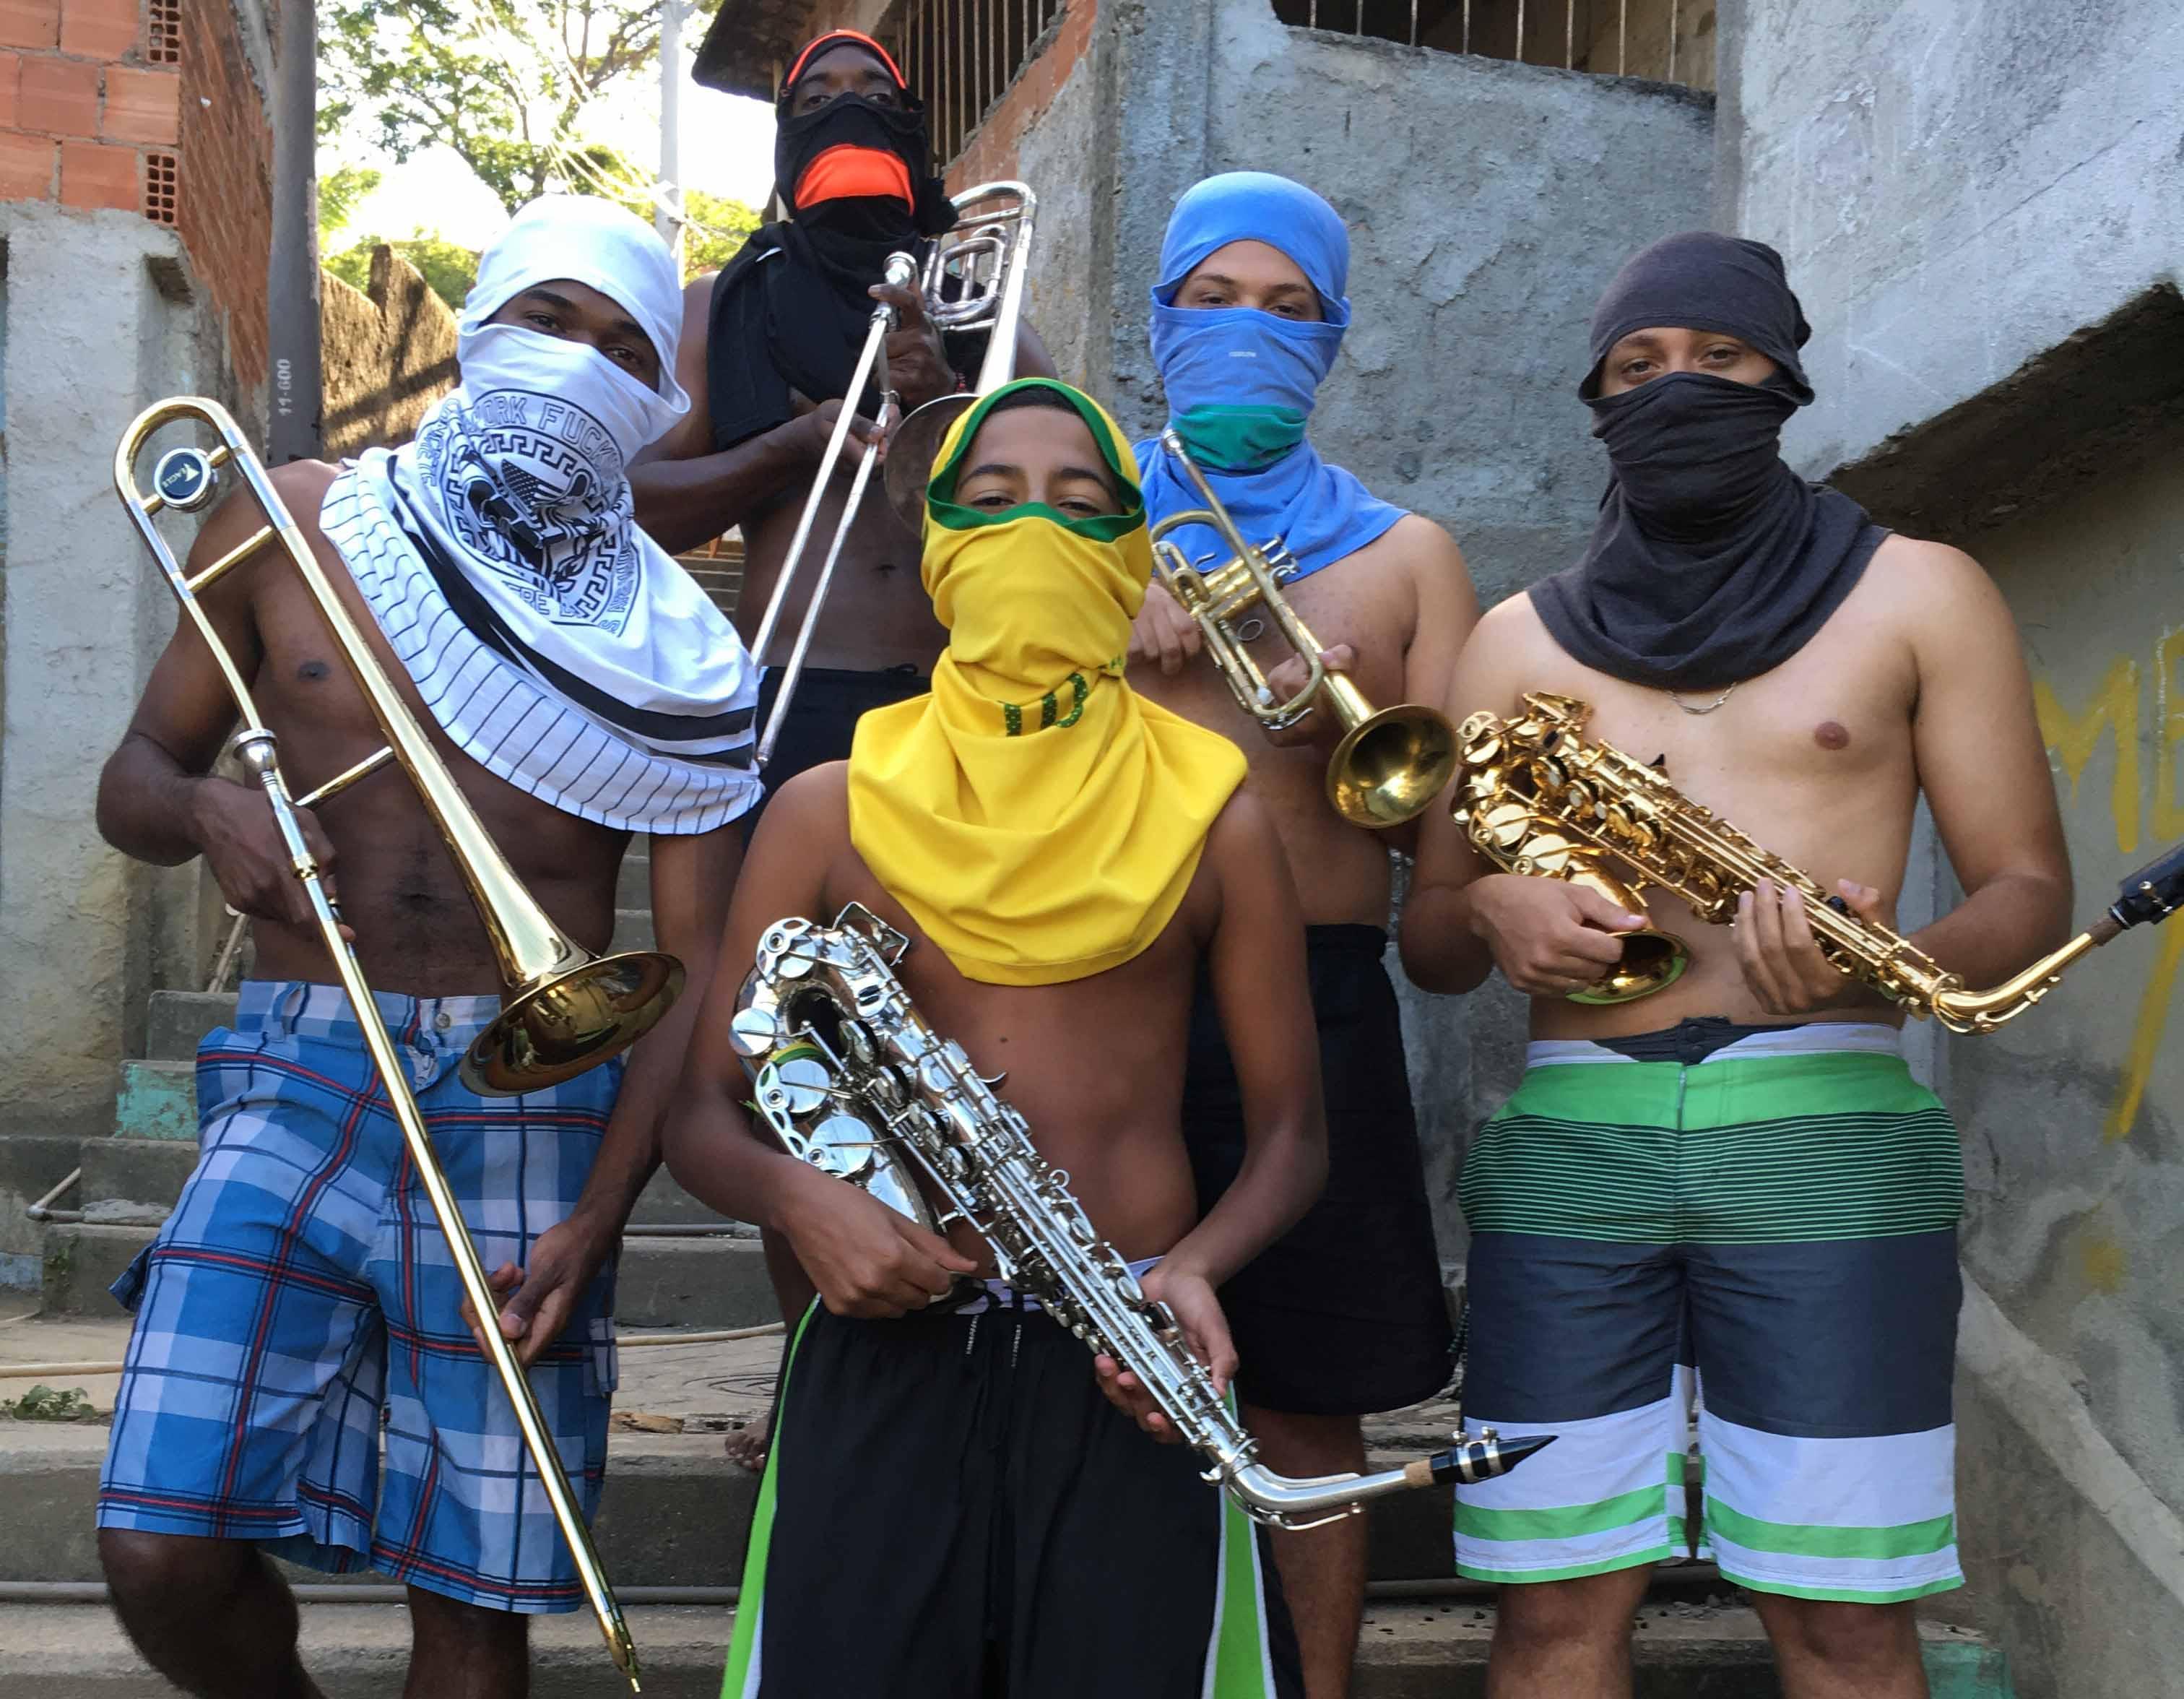 Os jovens Márcio Santana (trombone), Israel (saxofone), Misael (trompete), Gilson (trombone) e Matheus Silva (saxofone). No Morro do Borel. Foto: Anderson Valentim